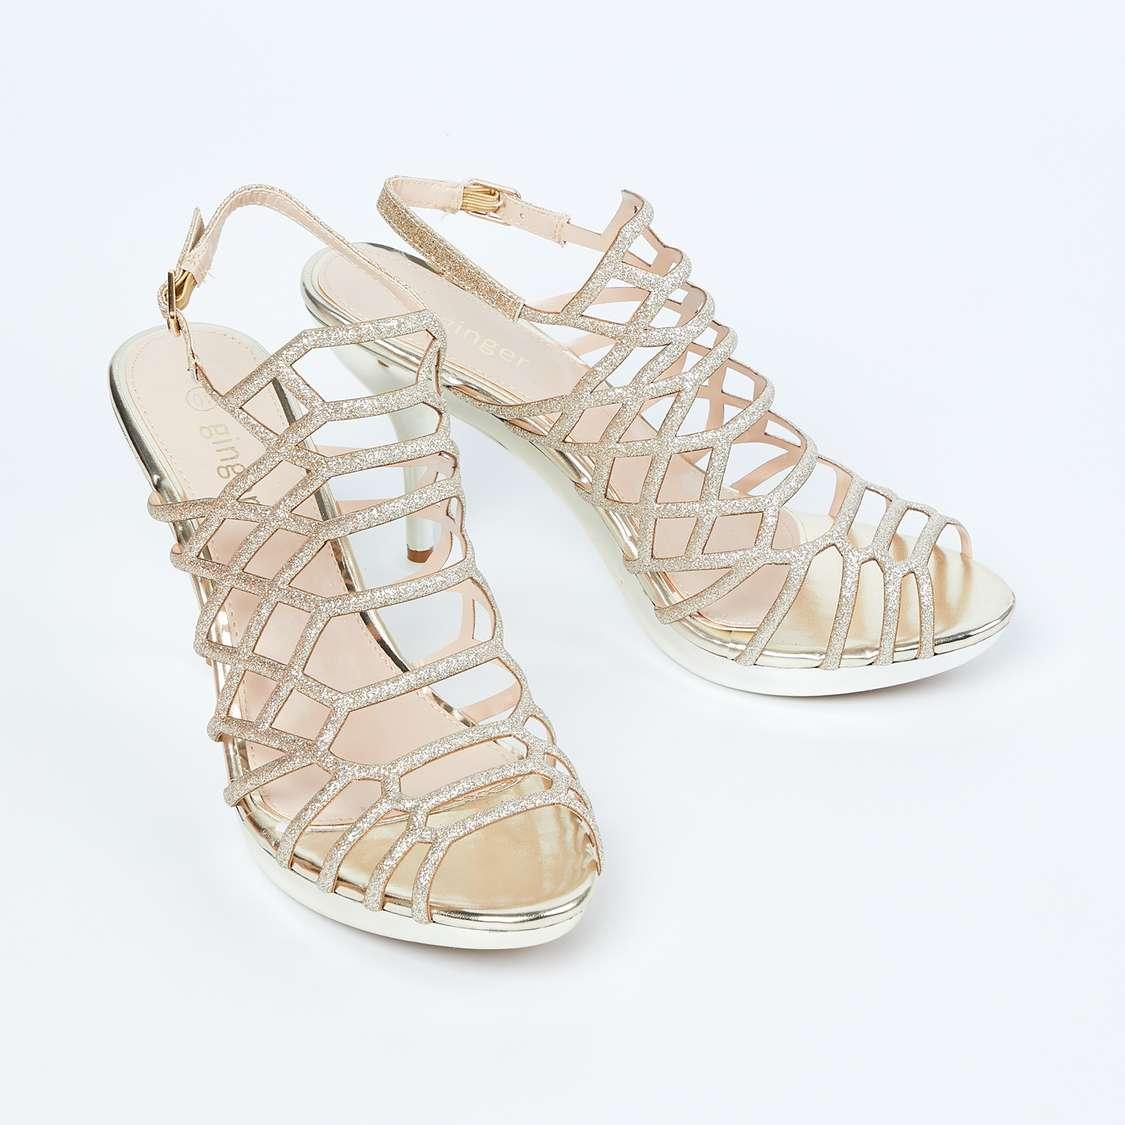 GINGER Glitter Caged Stiletto Heels